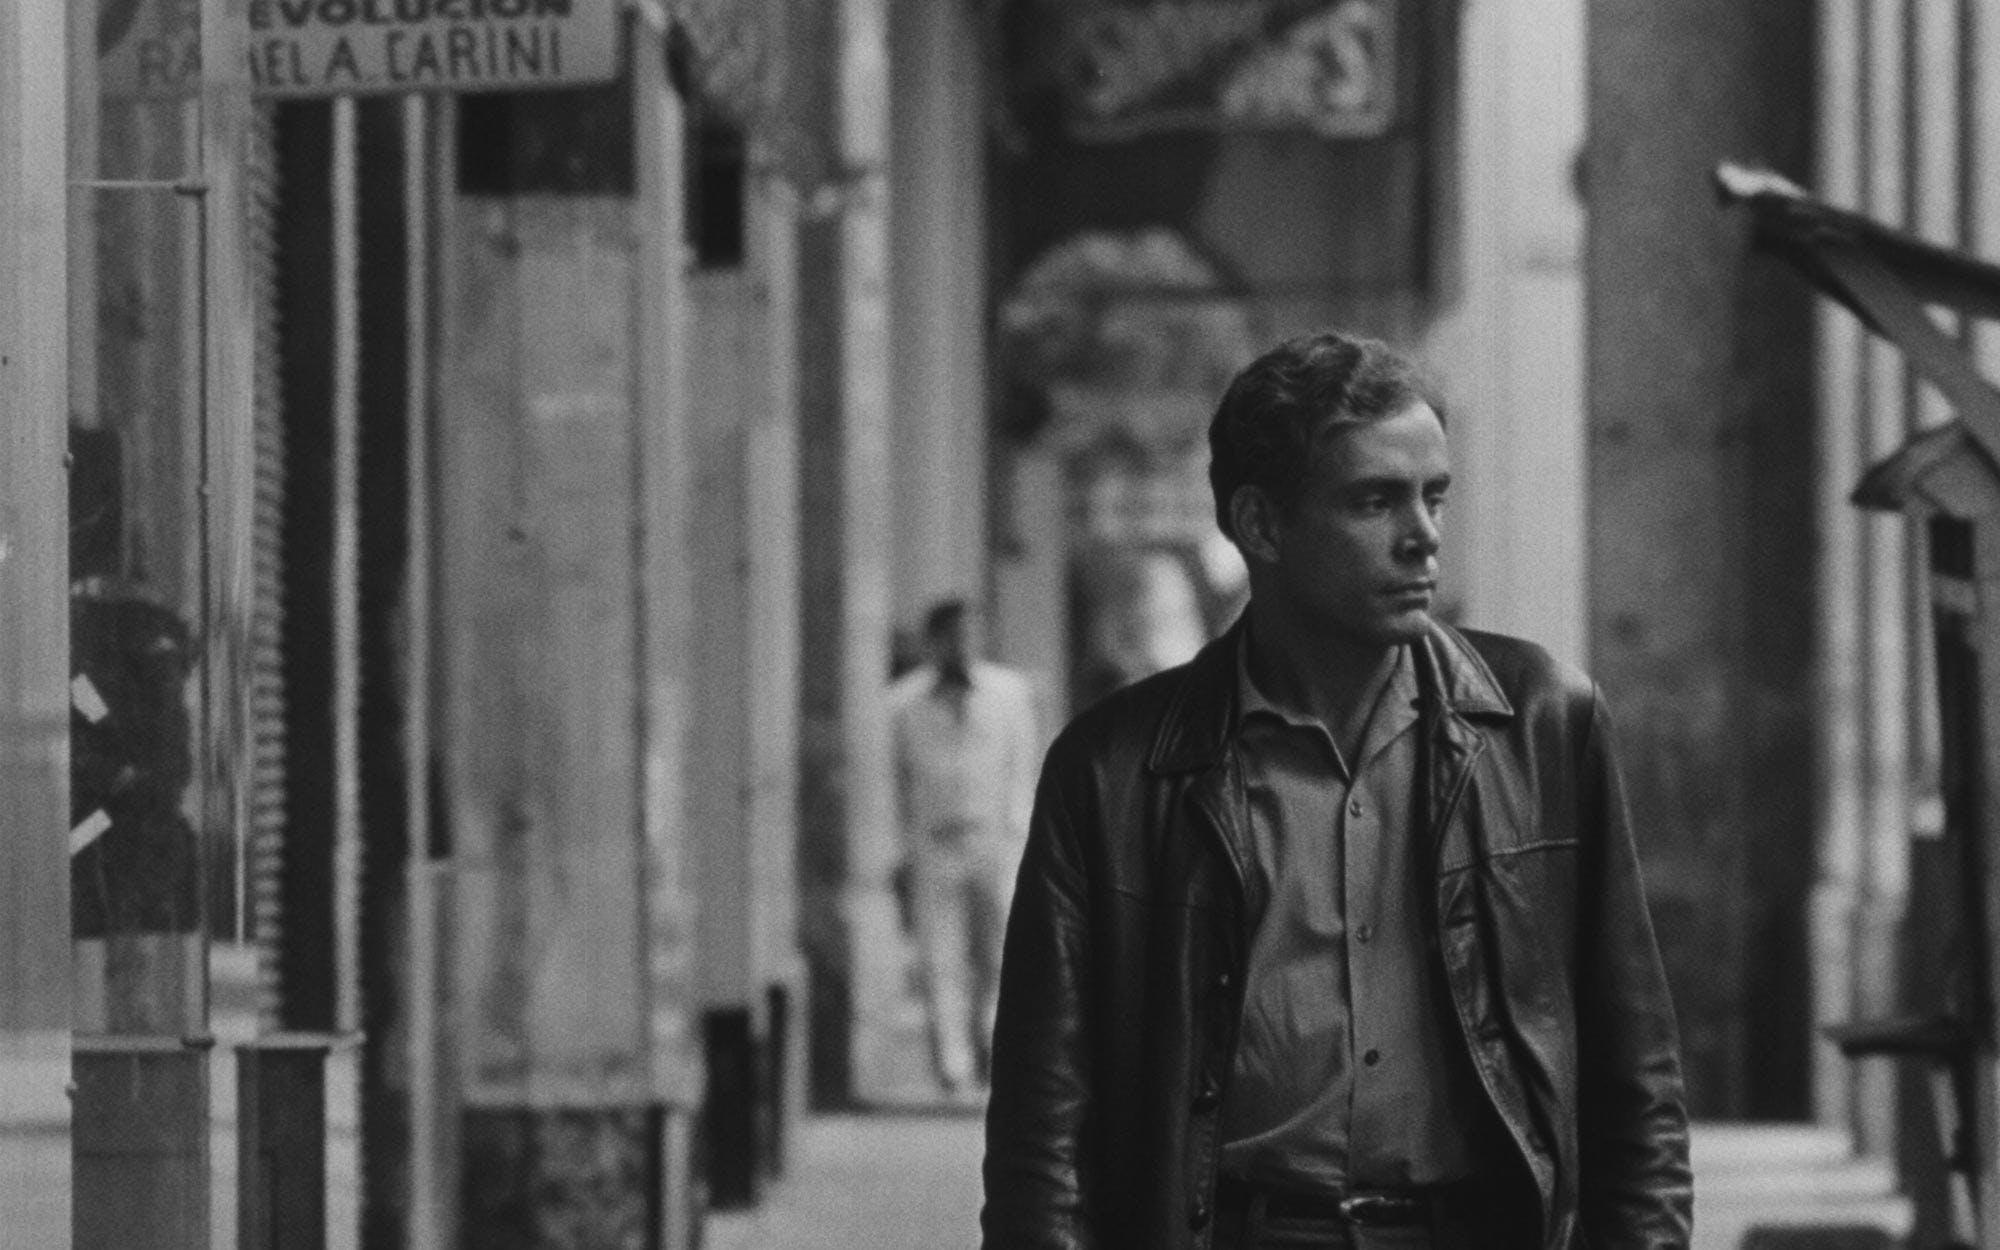 Cinema Revolution: Cuba Memories of Underdevelopment (Memorias del subdesarrollo)